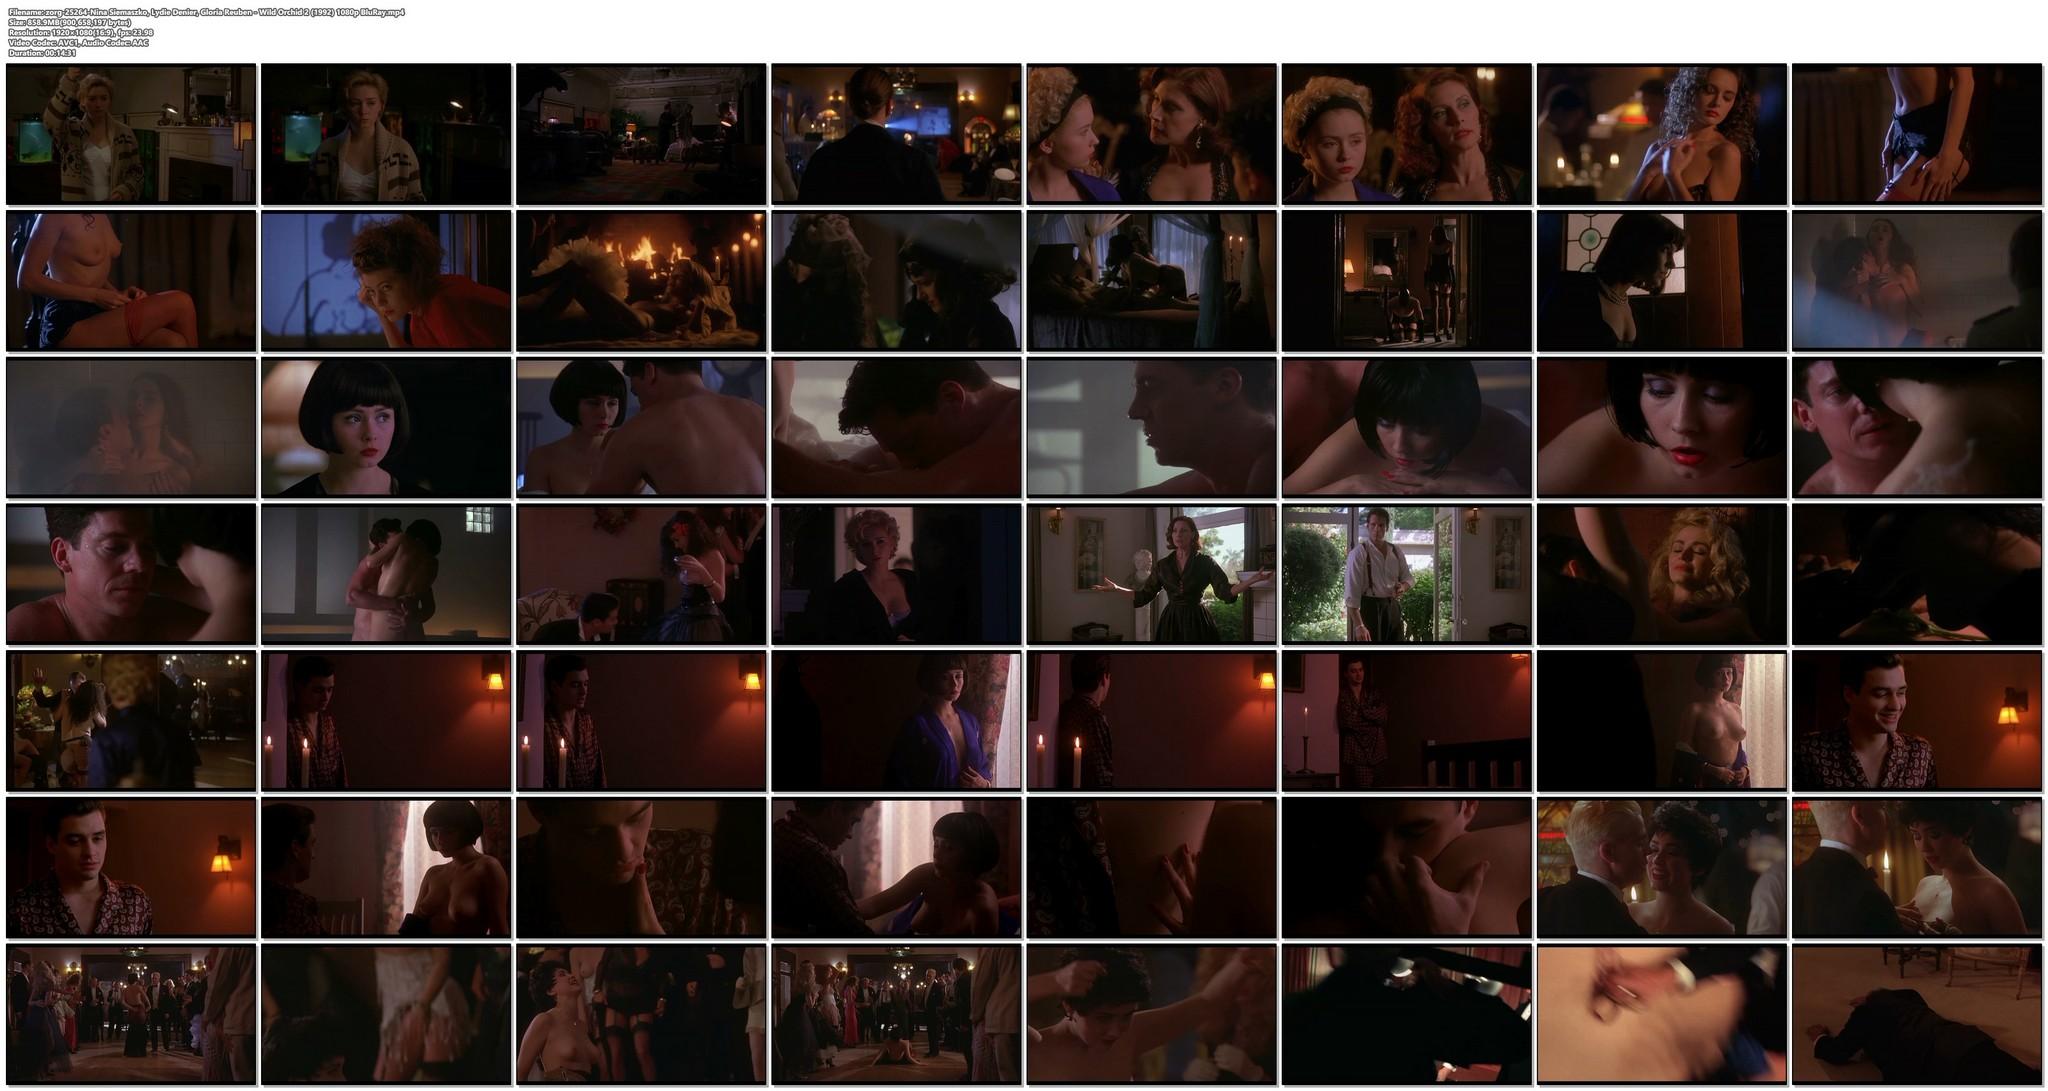 Nina Siemaszko nude sex Lydie Denier Gloria Reuben and others nude sex Wild Orchid 2 1992 1080p BluRay 20